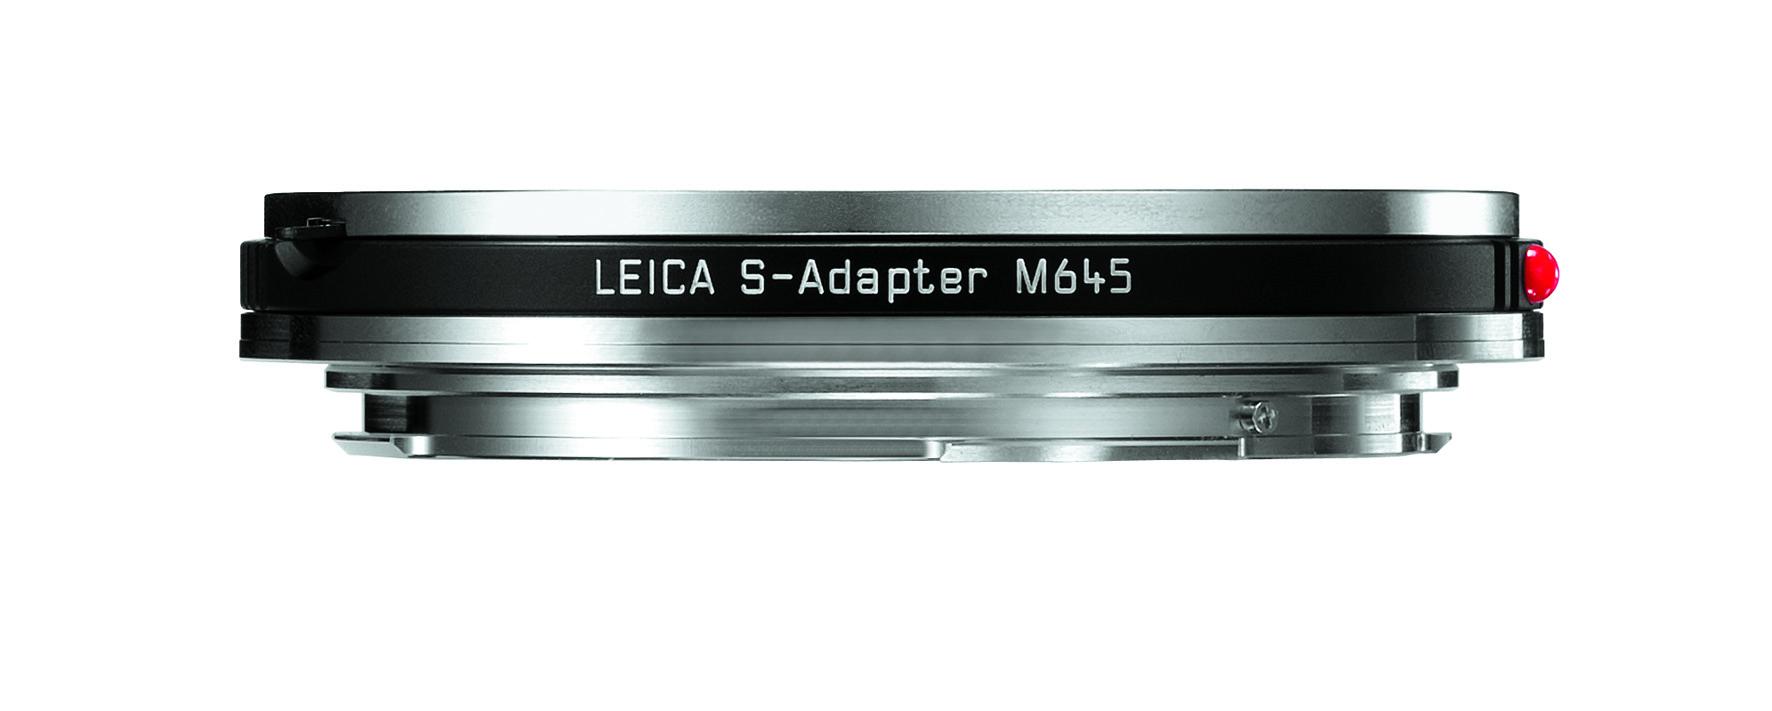 S-Adapter M645